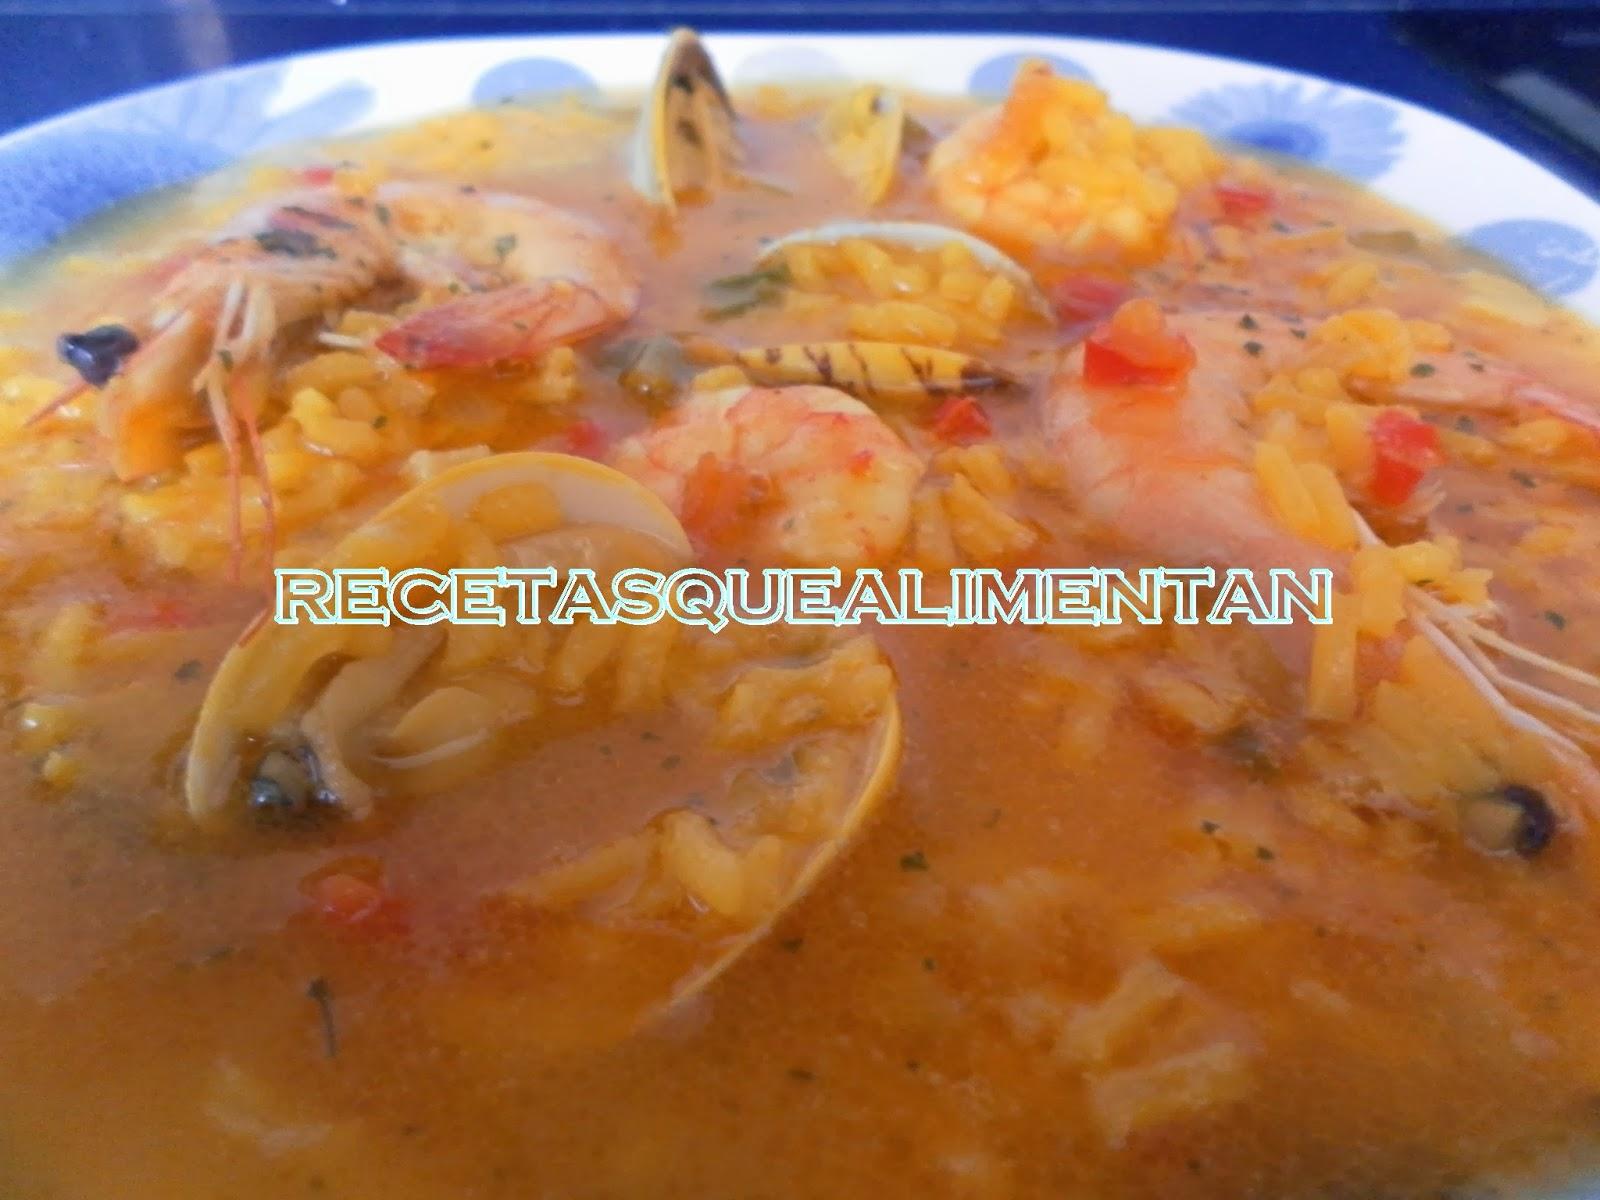 Recetas que alimentan arroz caldoso con almejas y gambas - Arroz con gambas y almejas ...